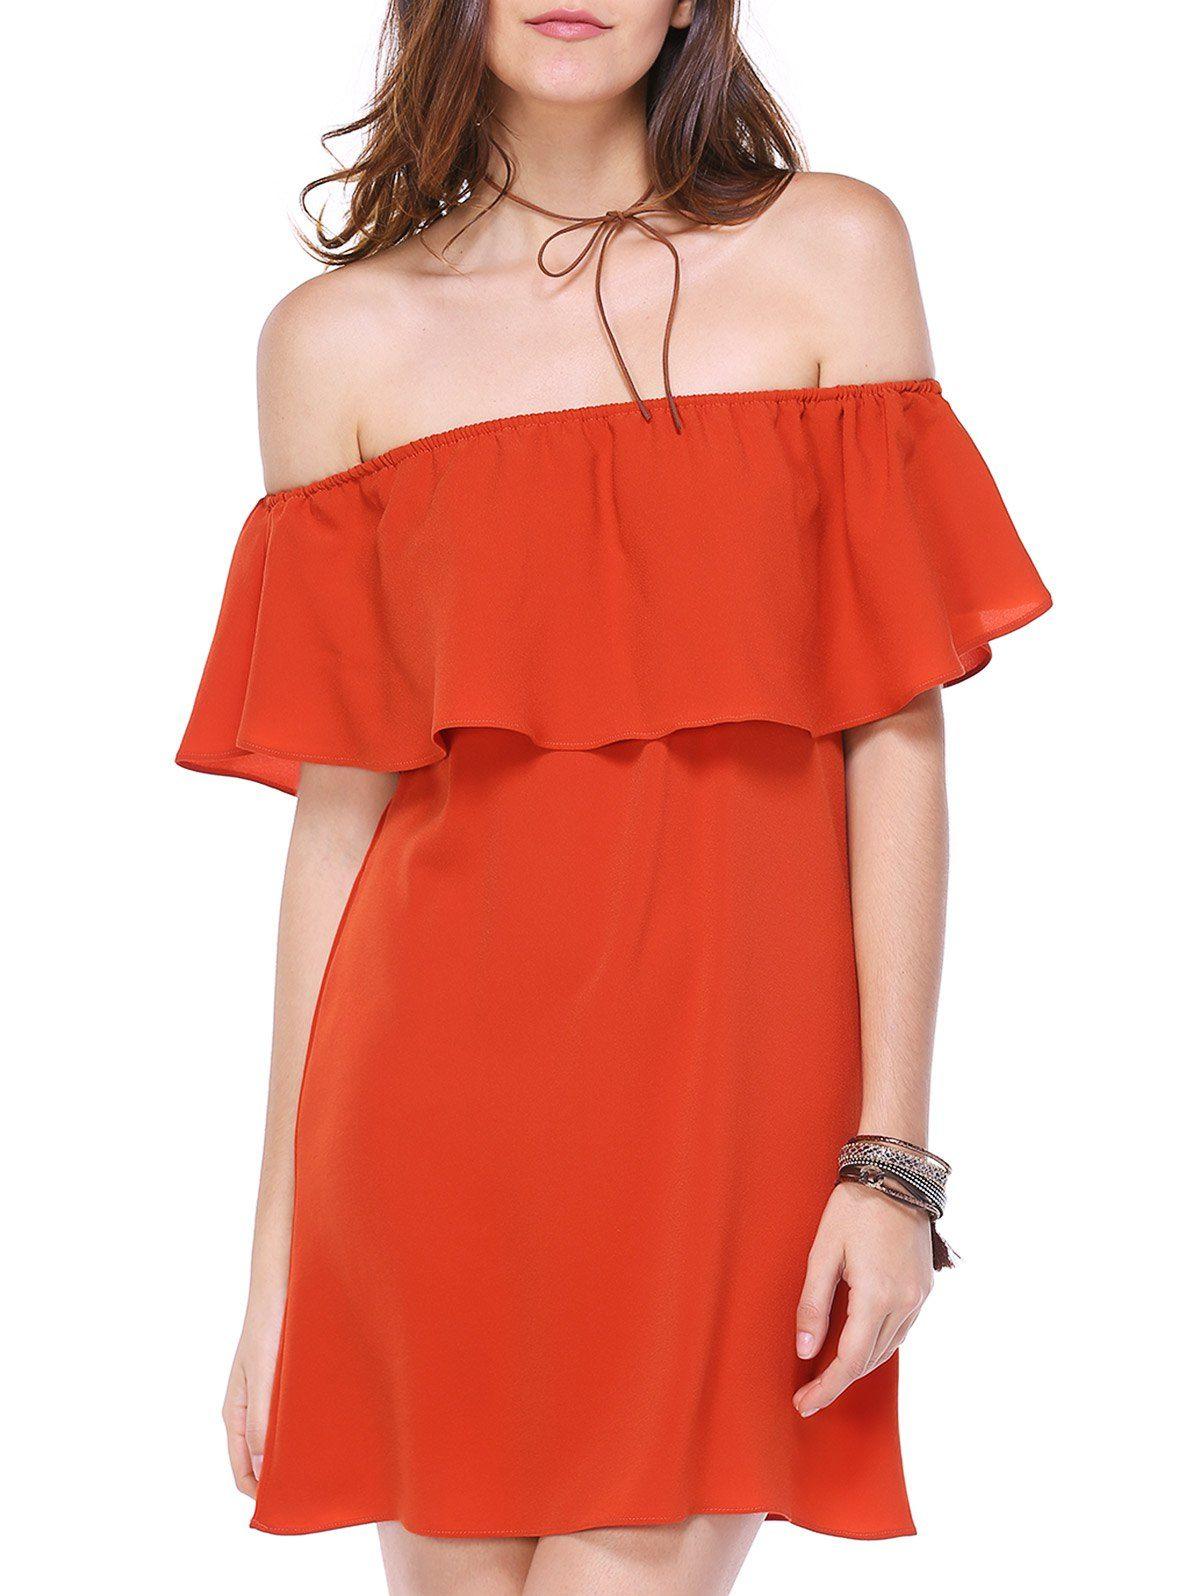 58b12753a47d Stylish Off The Shoulder Flounce Chiffon Dress For Women